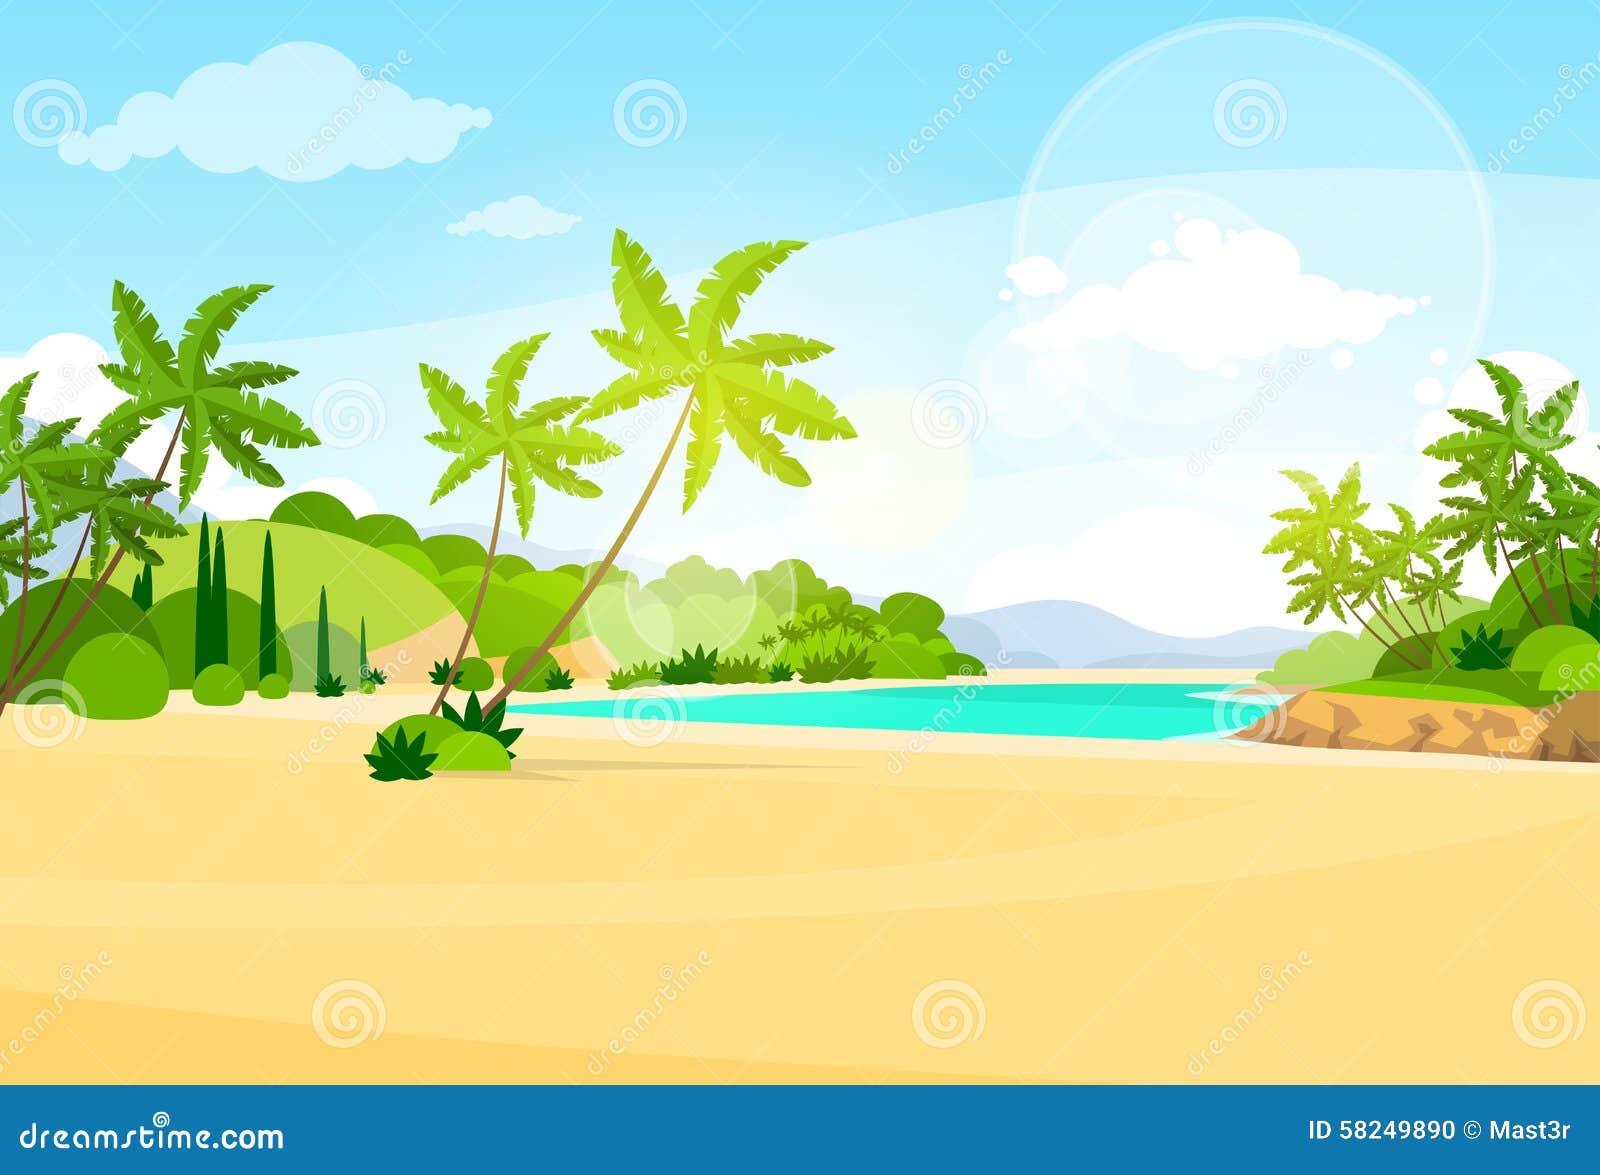 Tropical Island Cartoon: Tropical Beach Island Palm Tree Ocean Summer Stock Vector